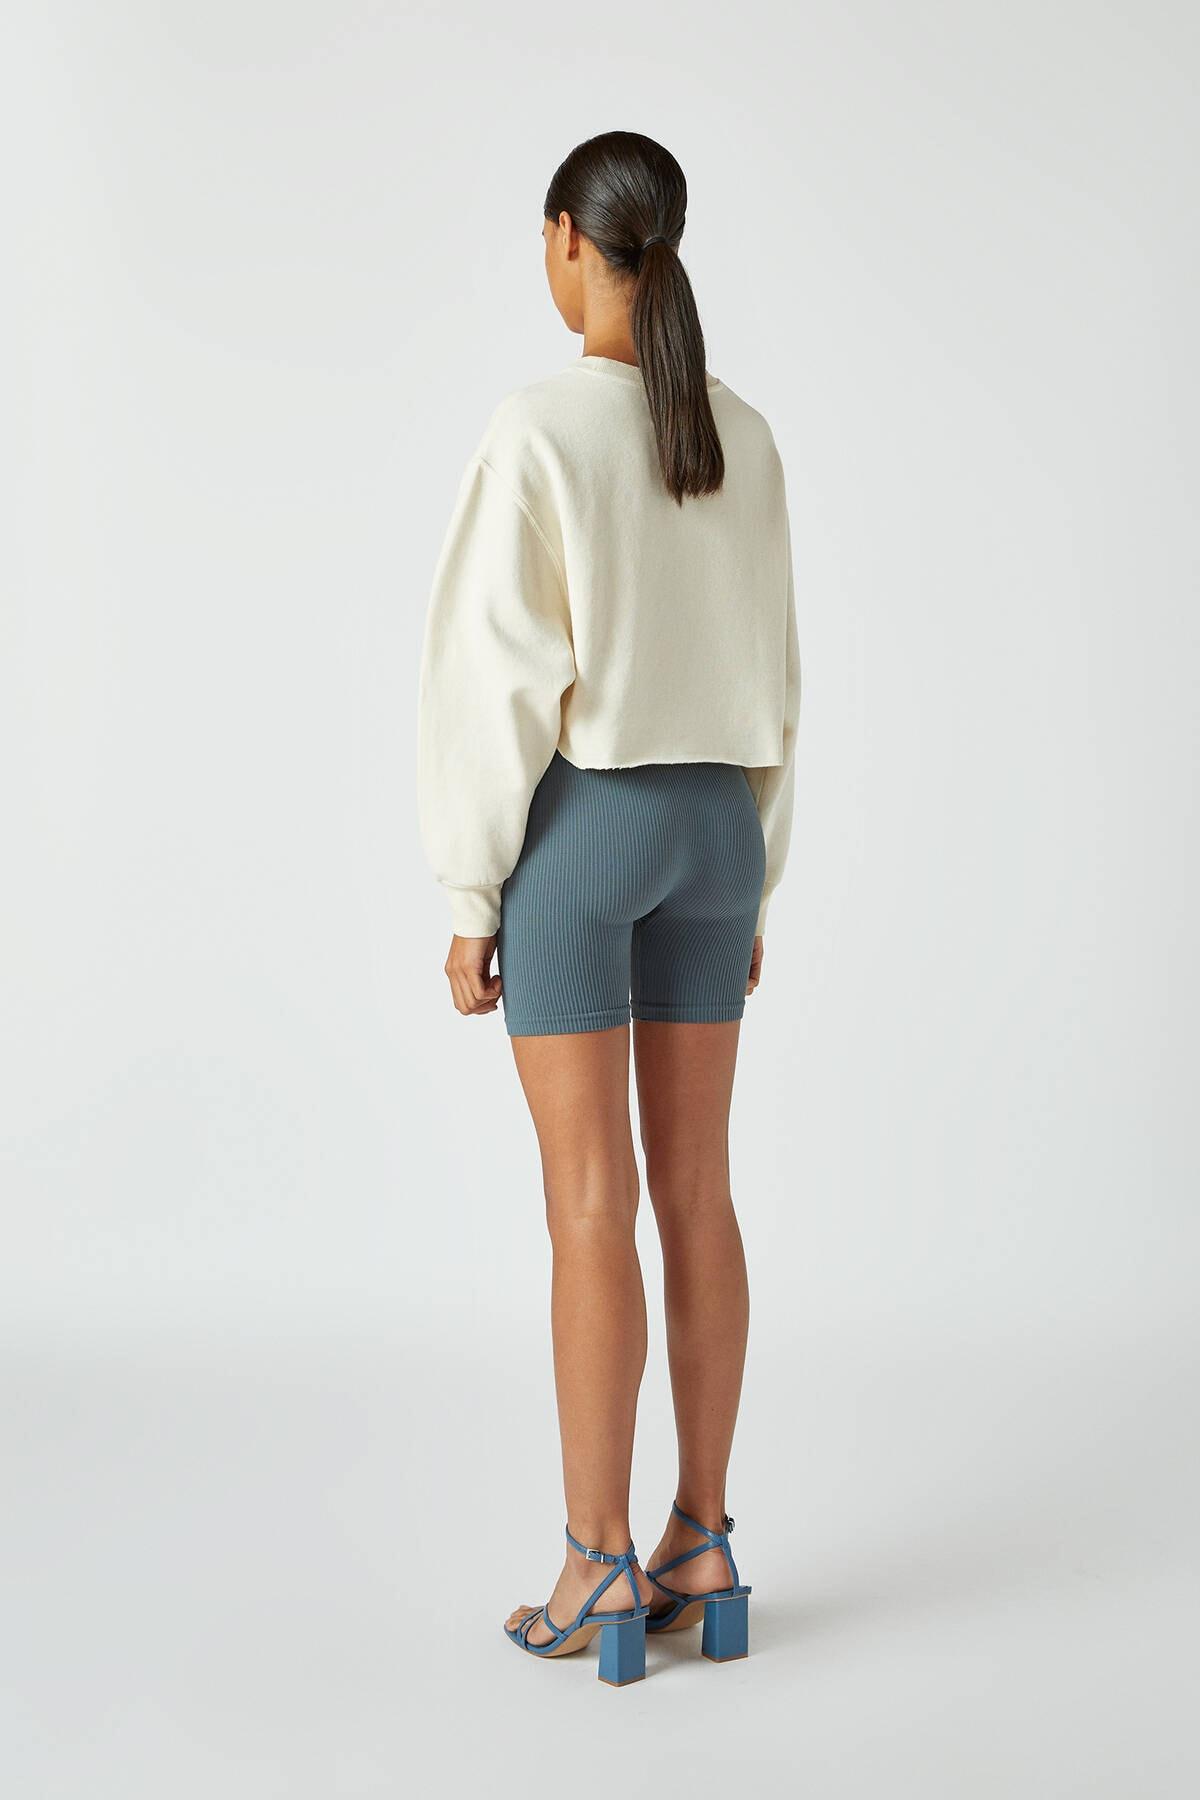 Pull & Bear Kadın Buz Rengi Rahat Crop Fit Sweatshirt 09594315 2